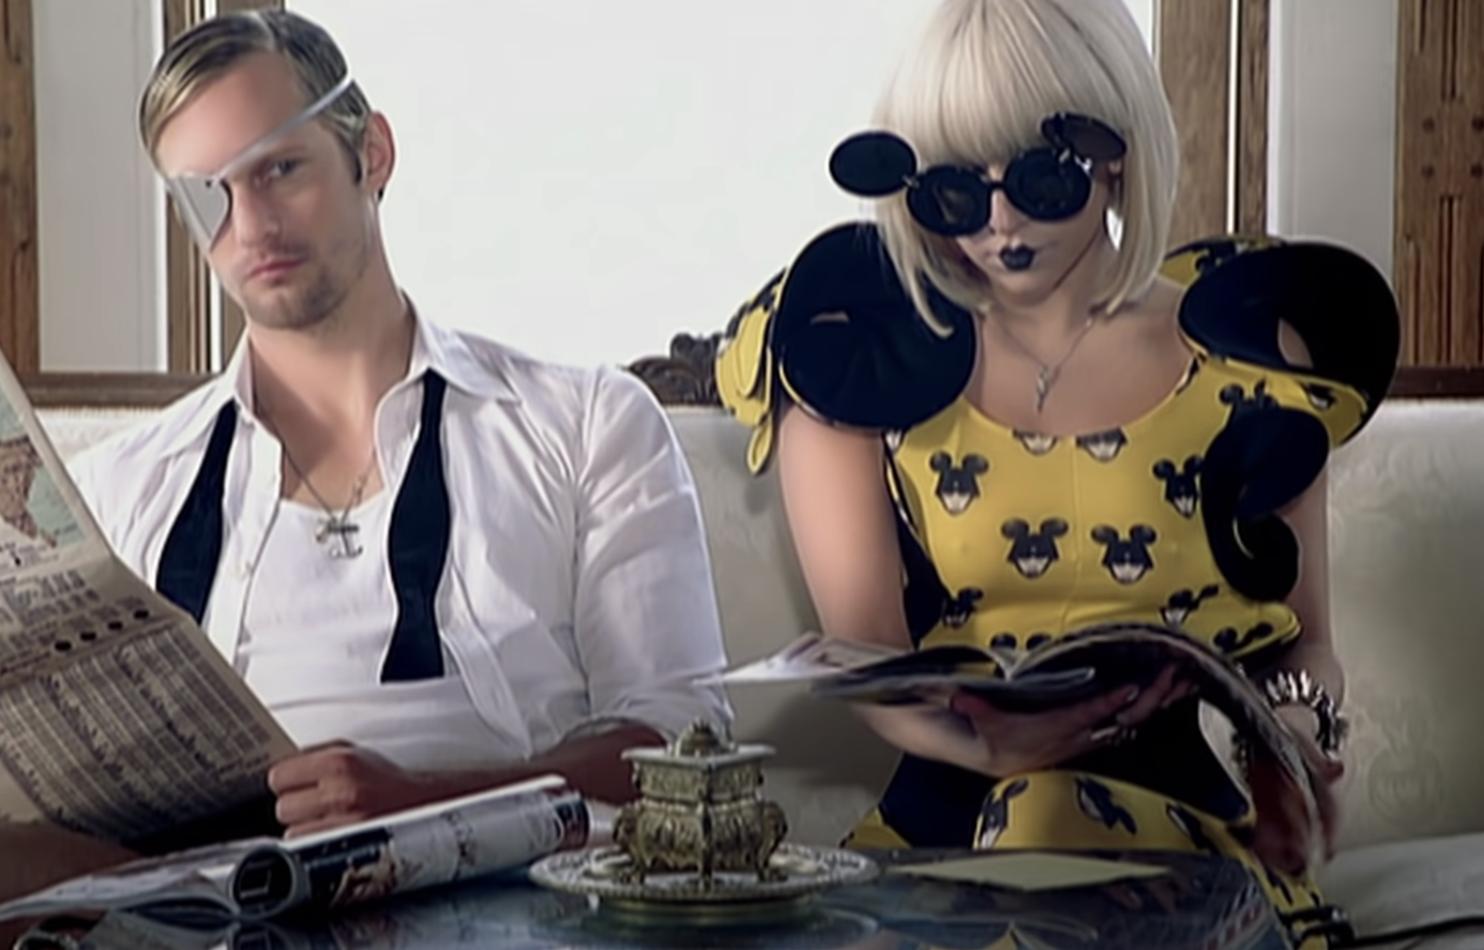 Gaga sitting alongside Alexander Skarsgard as she flips through a magazine